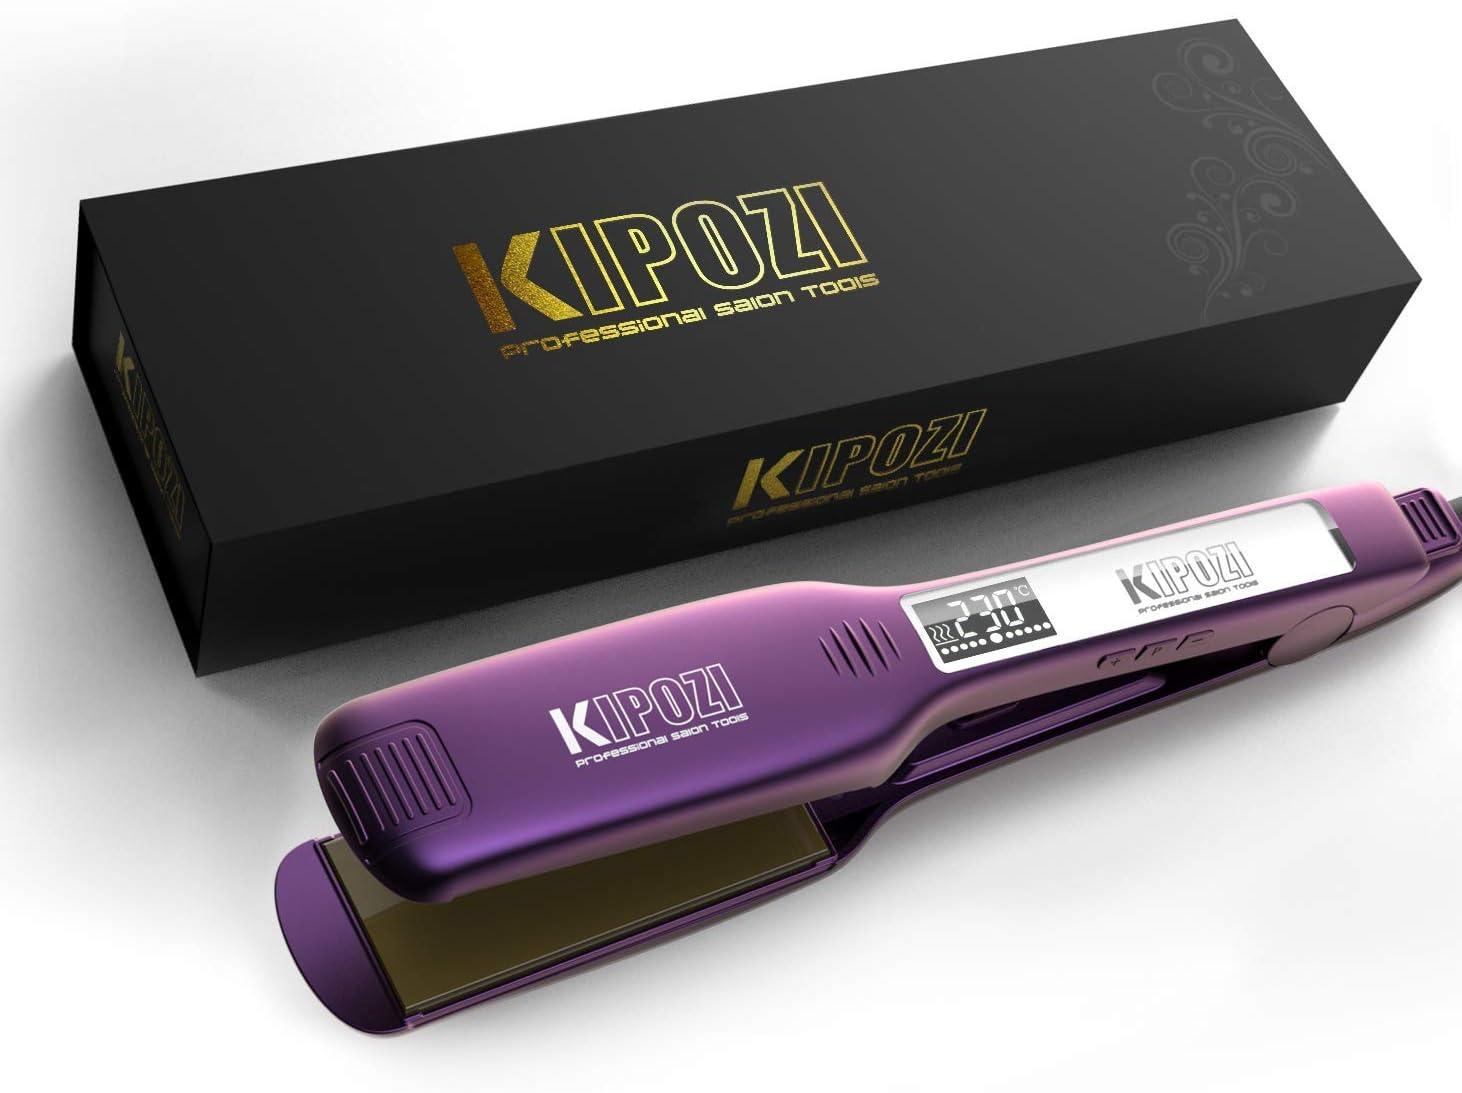 KIPOZI Professional Hair Straighteners 1.75 Inch Wide Plate Titanium Flat Iron with Digital LCD Display, Purple